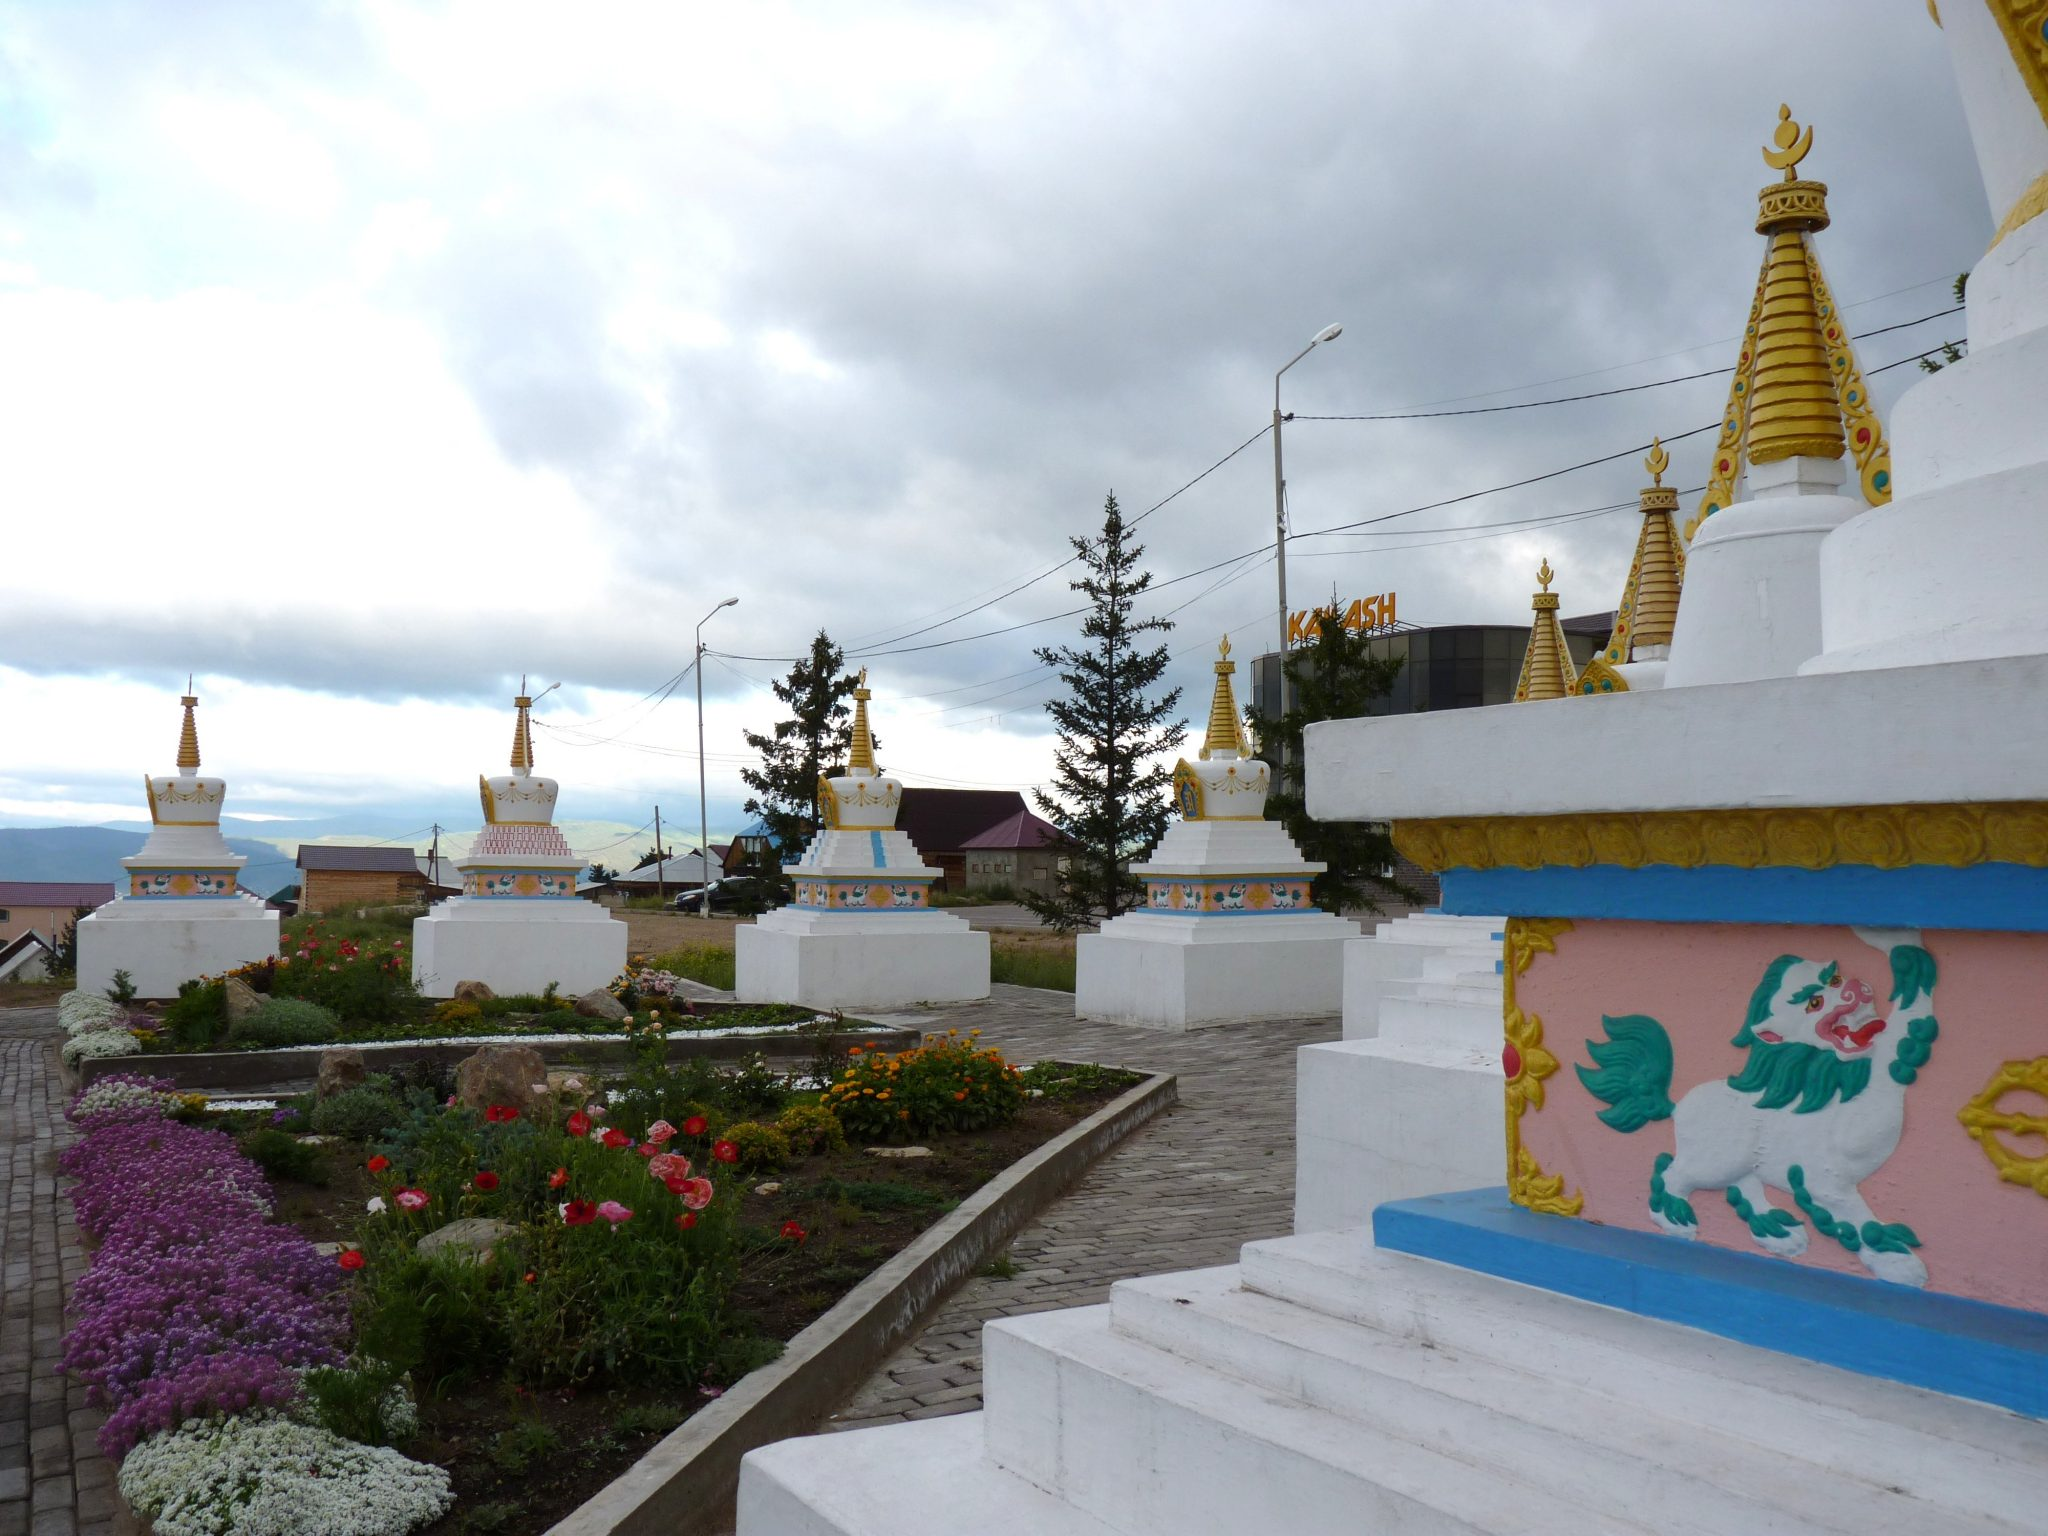 Rinpoche Bagsha 02 Ulan-Ude Rússia Mundo Indefinido